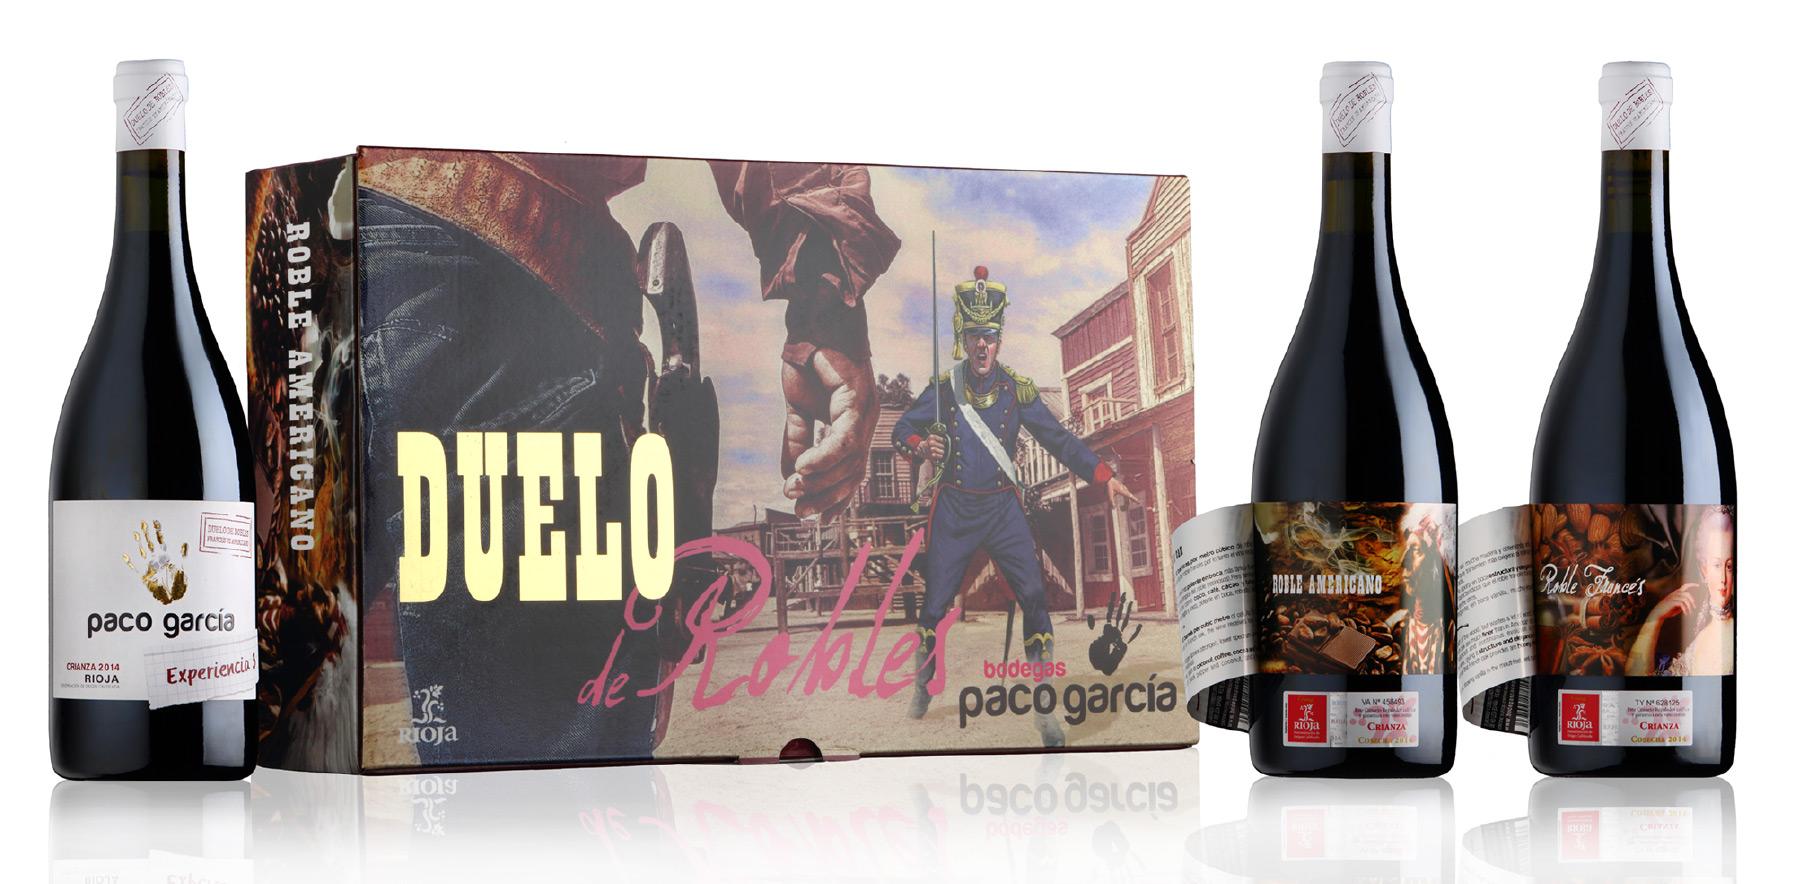 bodegas_paco_garcia-paco_garcia_experiencias-producto